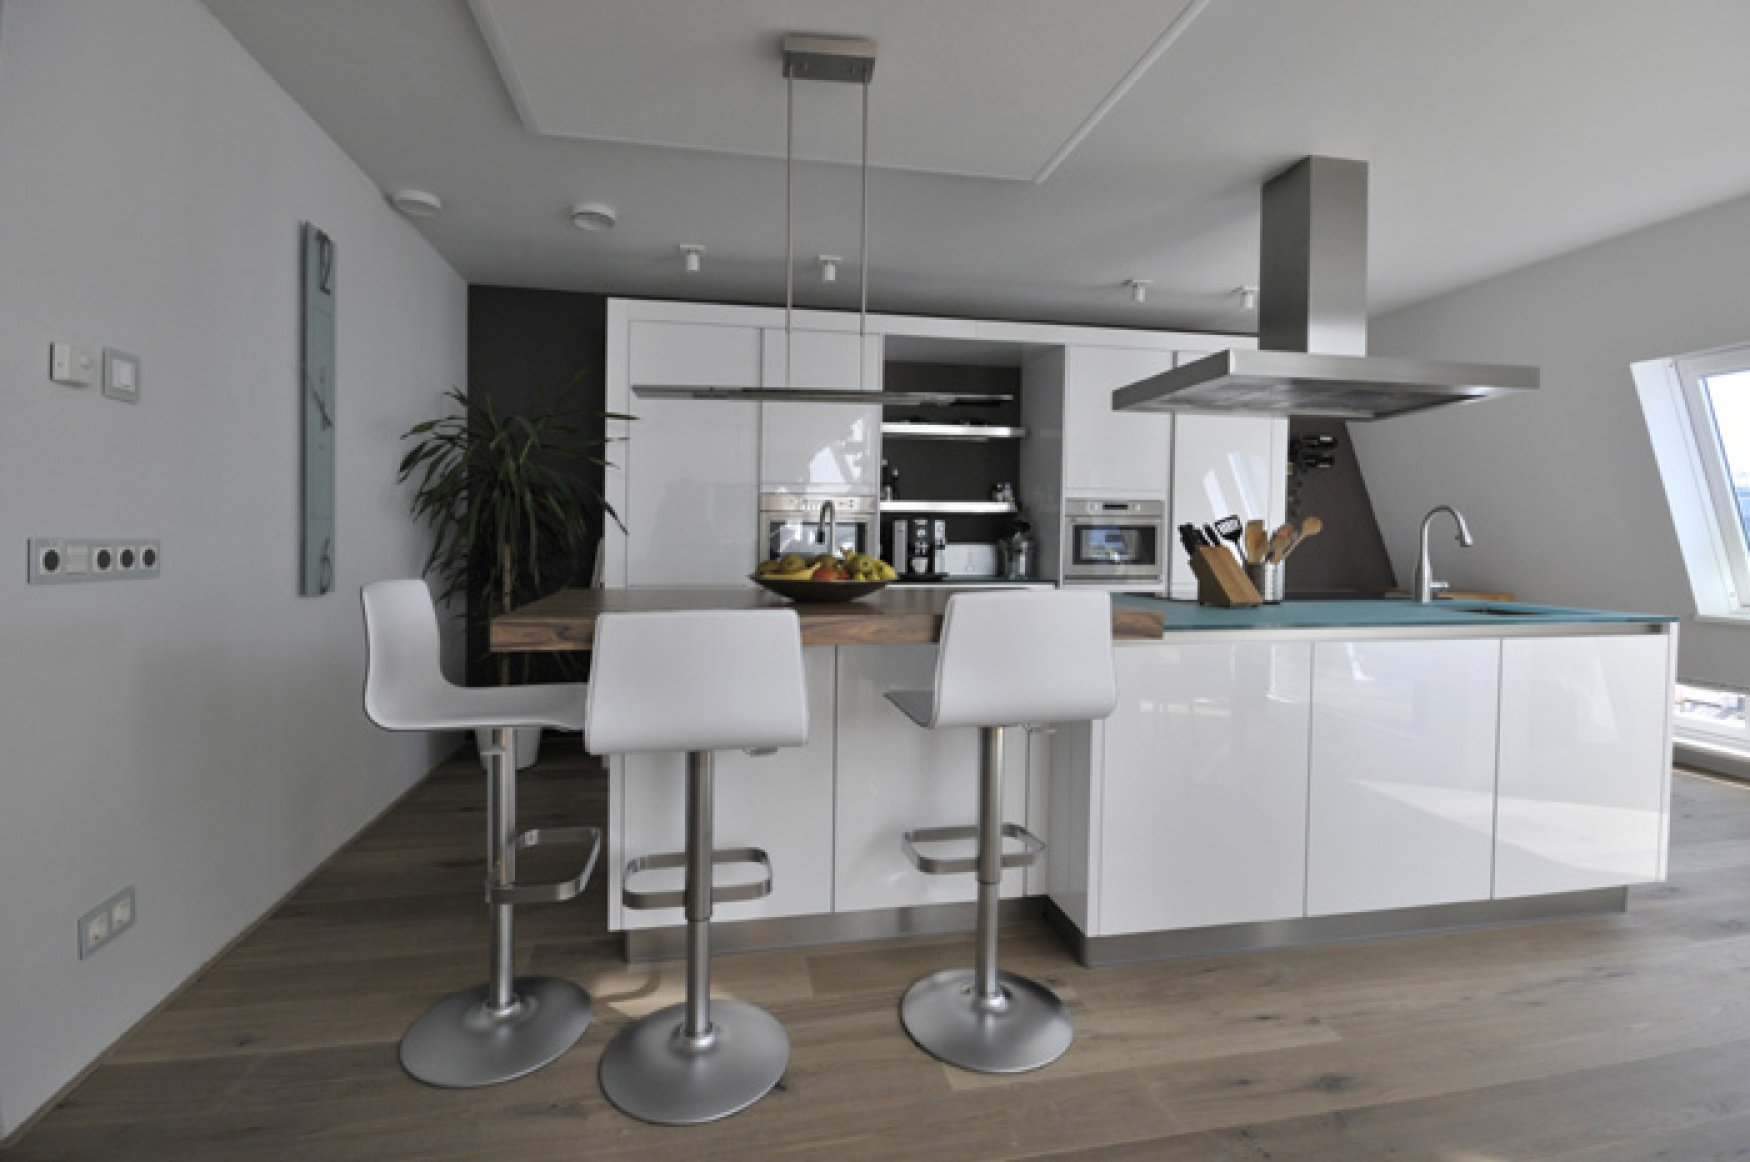 Hoekbank eethoek ikea keuken eethoek ikea eettafel bank i love my interior keuken eethoek ikea - Keuken m ilot centrale ...